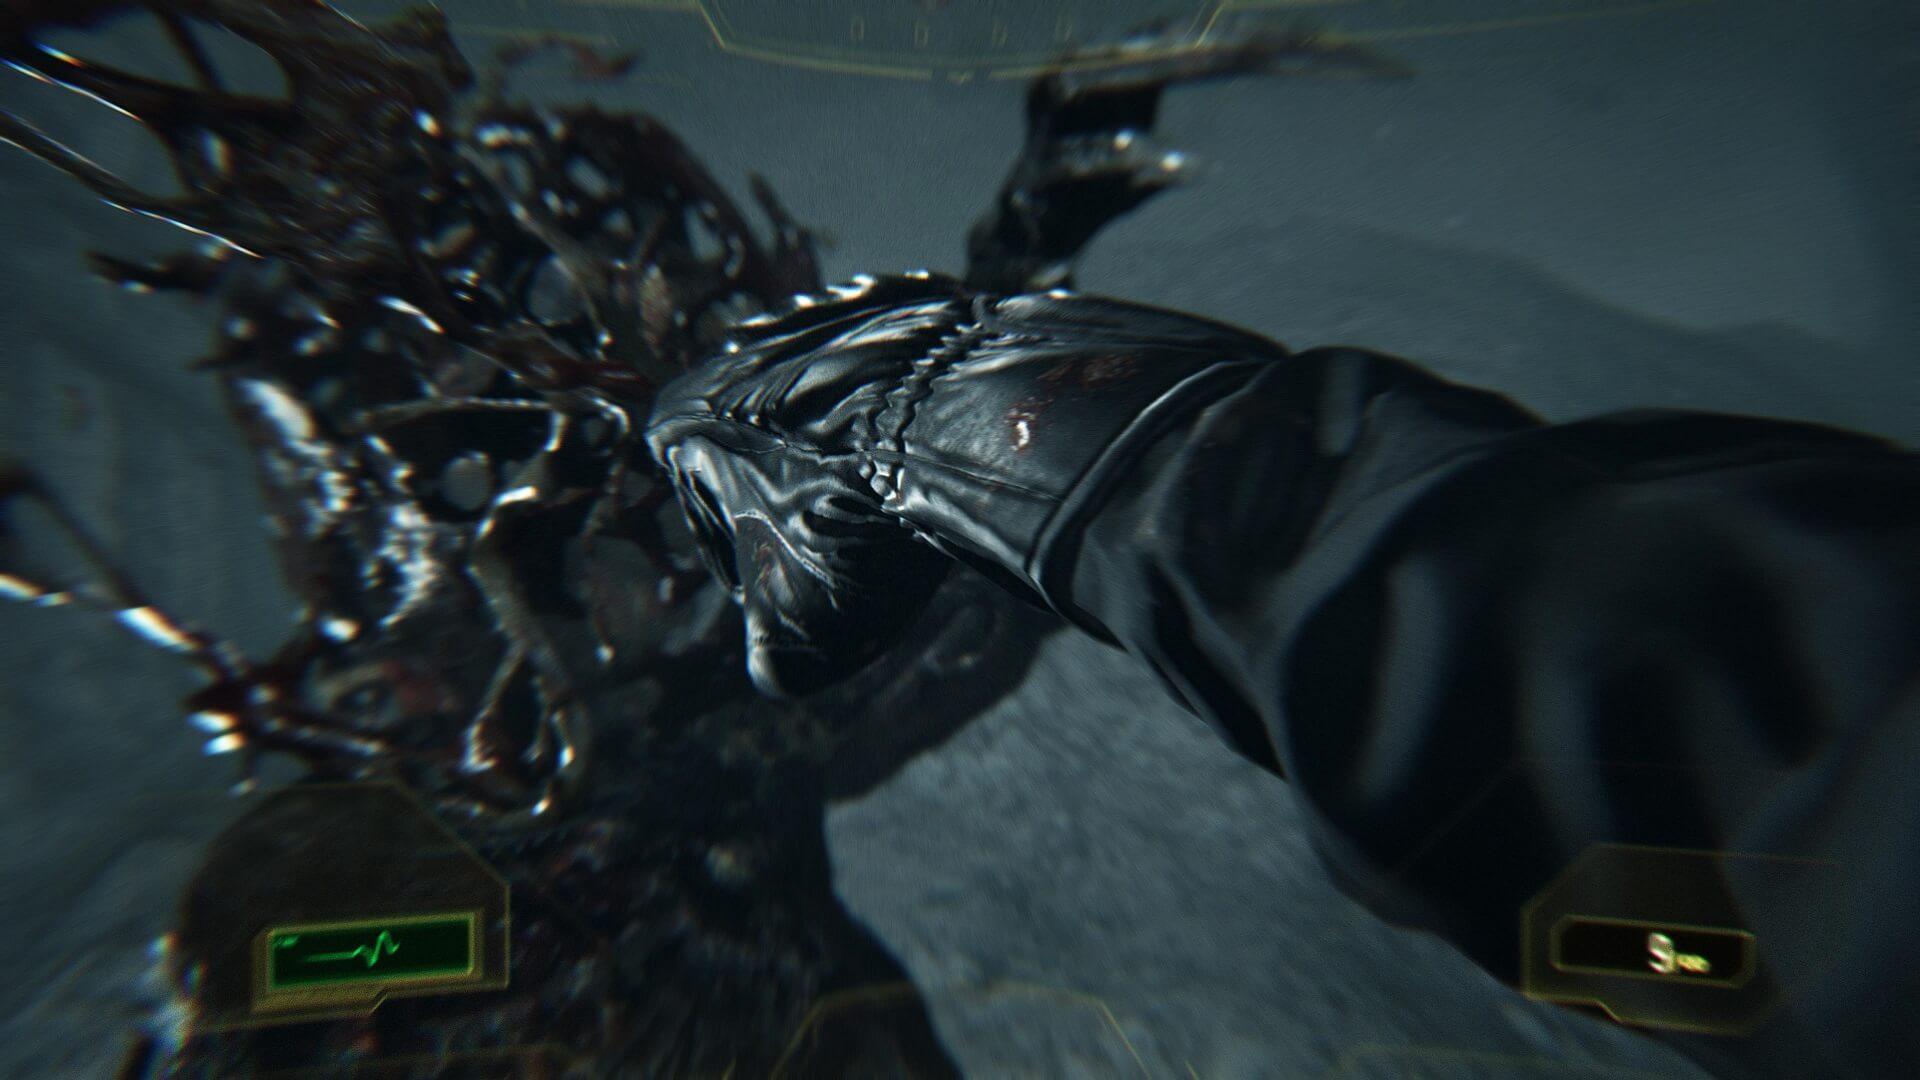 [Game 2017] มาแล้วตัวอย่าง Gameplay ใหม่ของ DLC Not A Hero ของเกม Resident Evil 7 พี่คริสยังคงหมัดหนักเหมือนเดิม!!